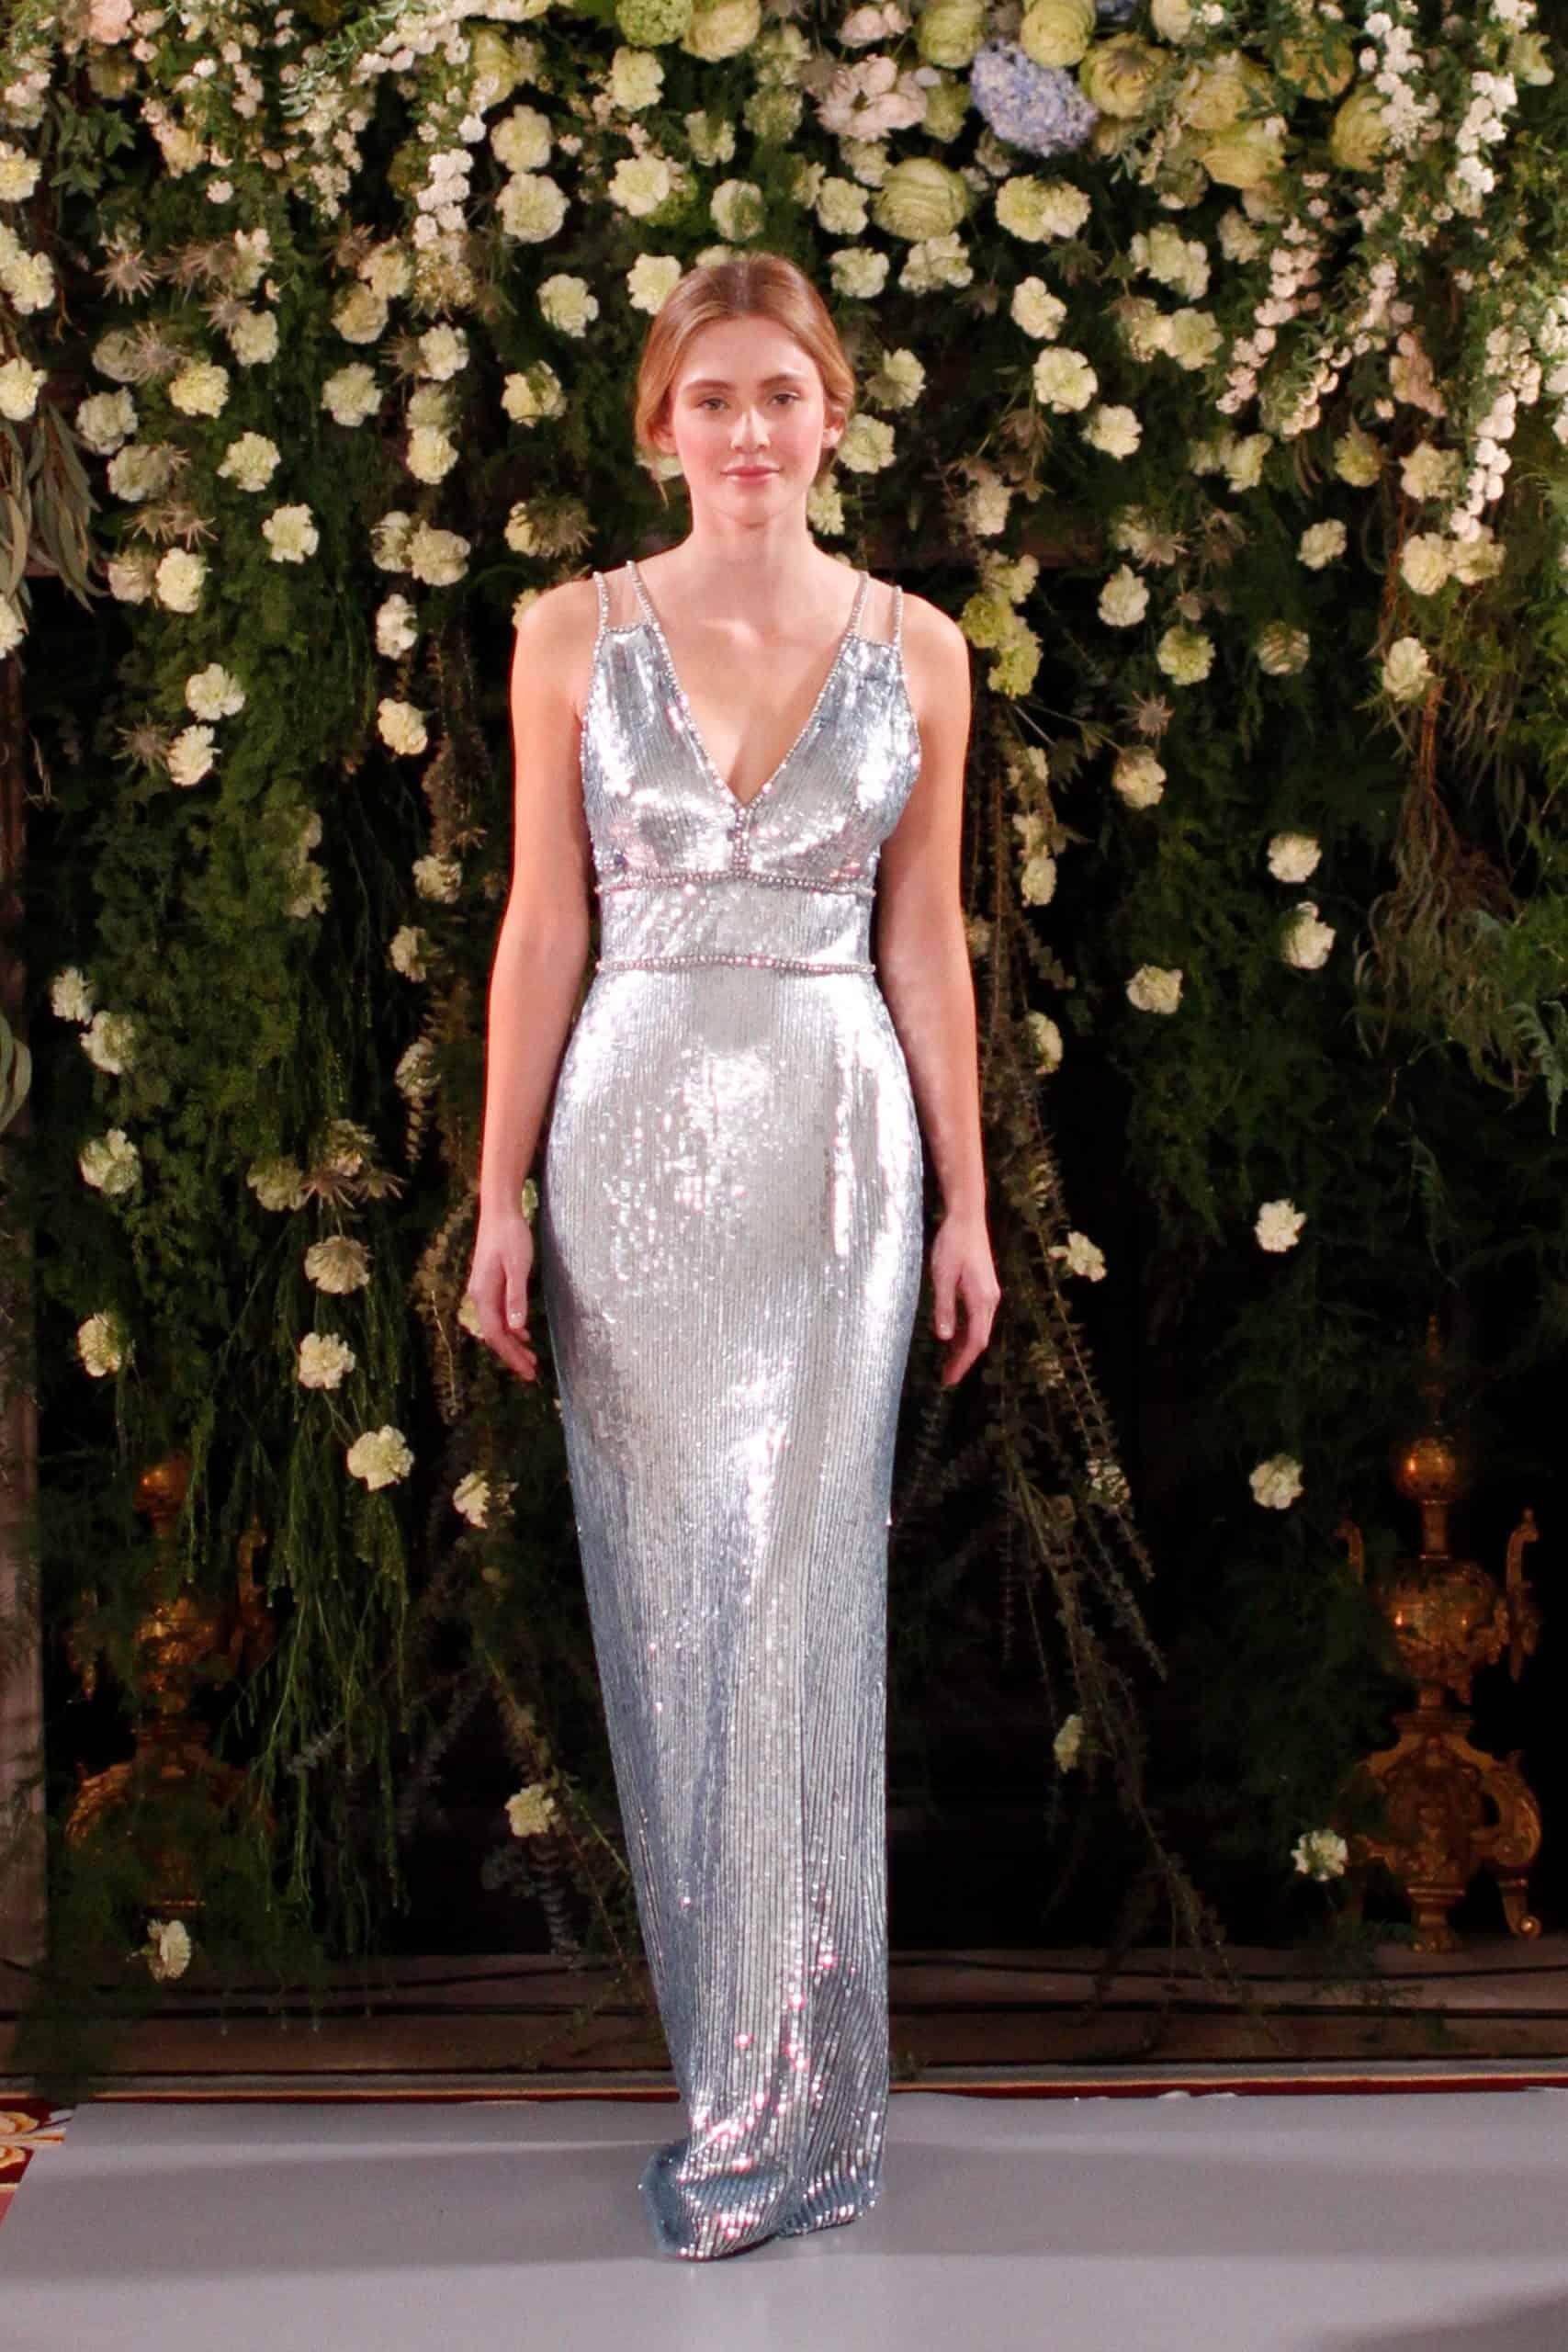 metallic wedding dress by Jenny Packham